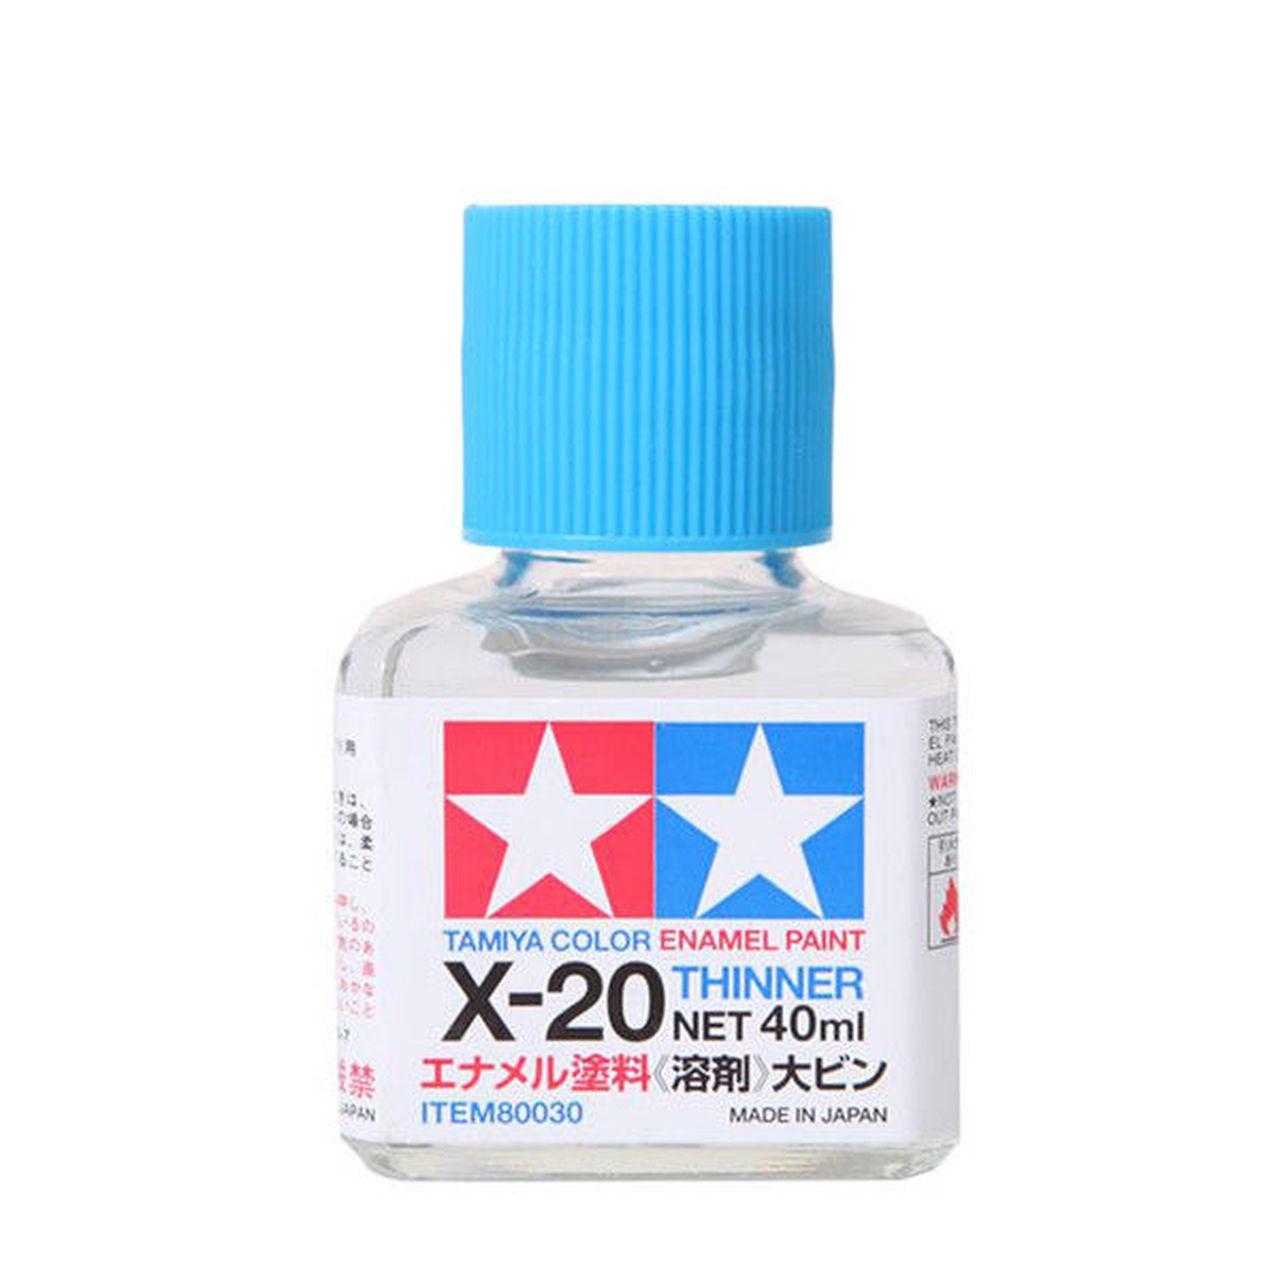 Tamiya #80030 X-20 Enamel Thinner 40ml